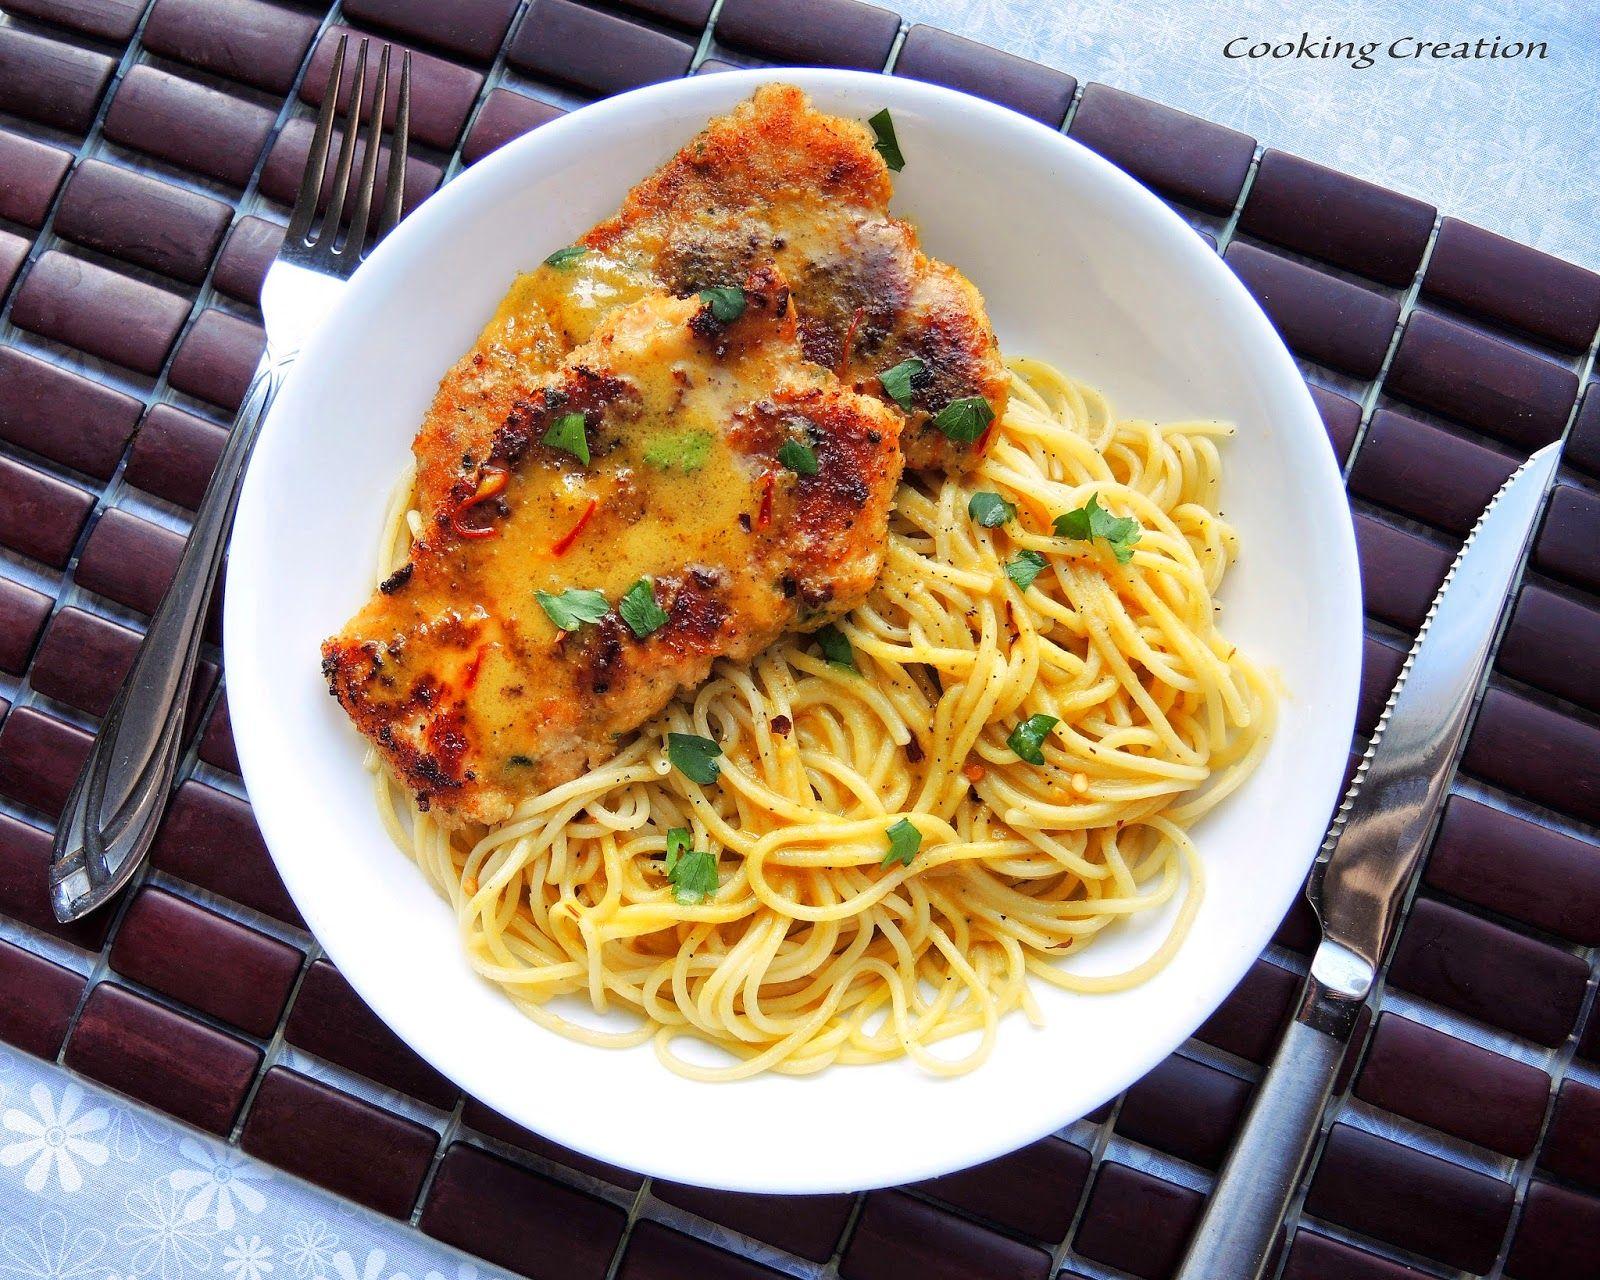 Cooking Creation: Chicken Scallopini with Saffron Cream Sauce